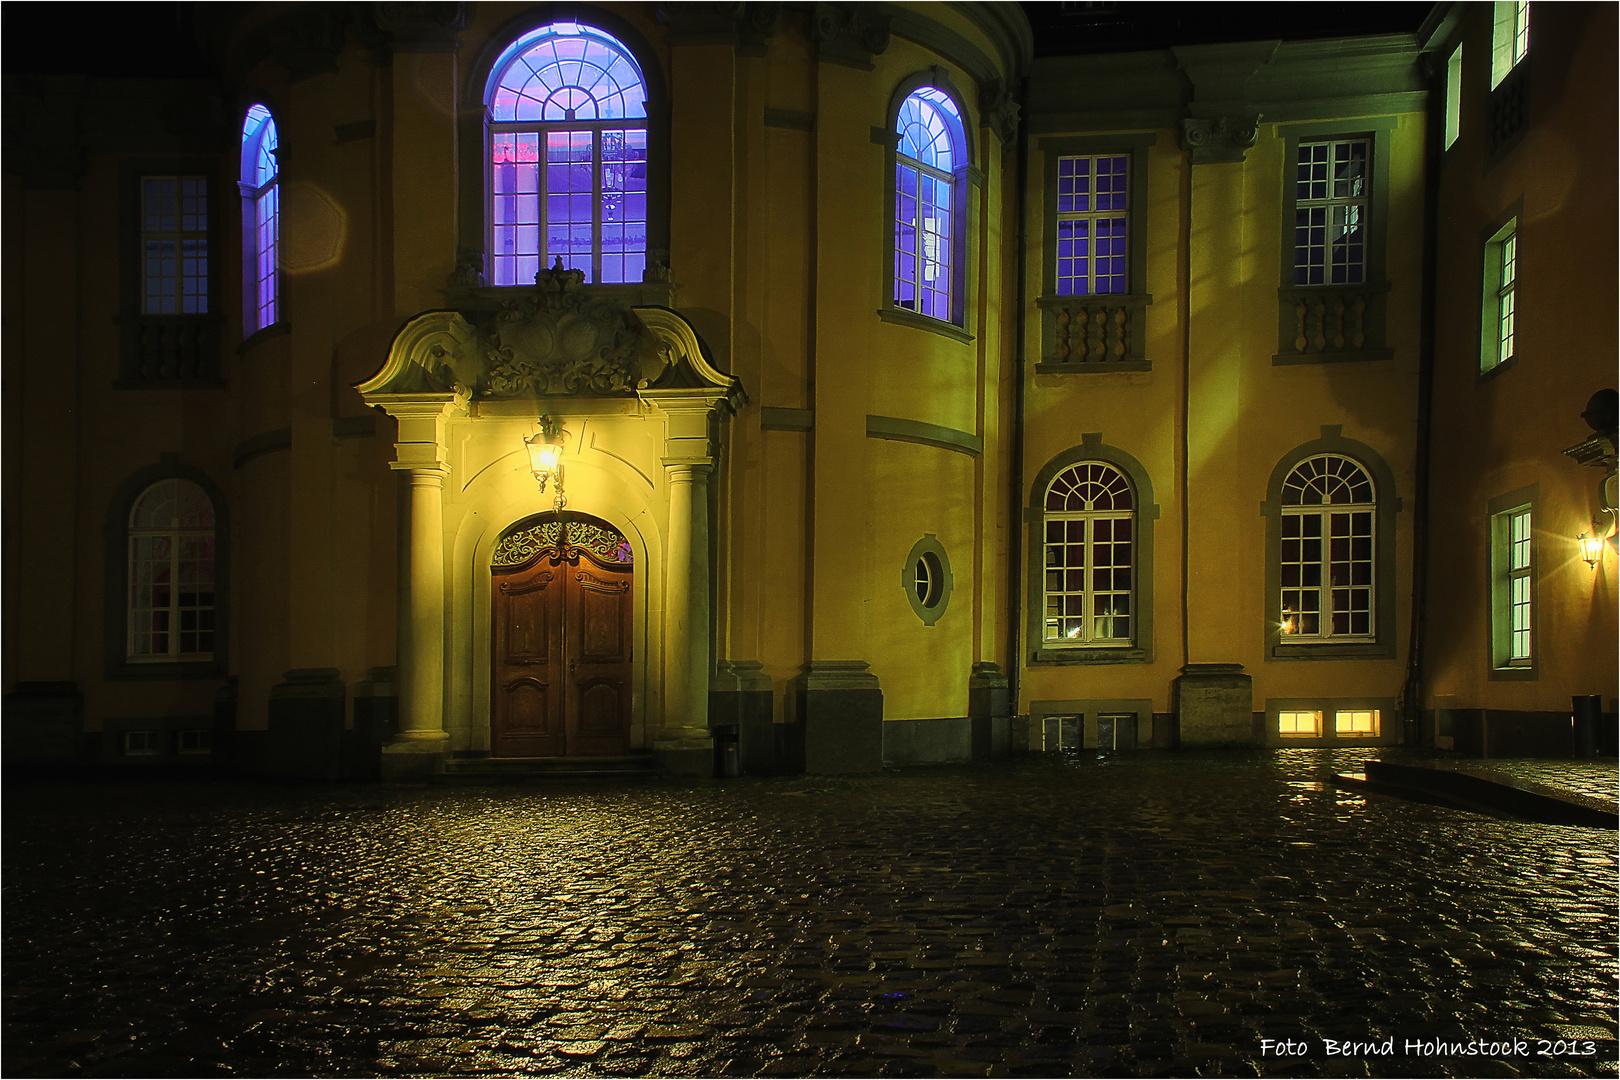 Schloß Dyck Innenhof ...Illumina 10.0